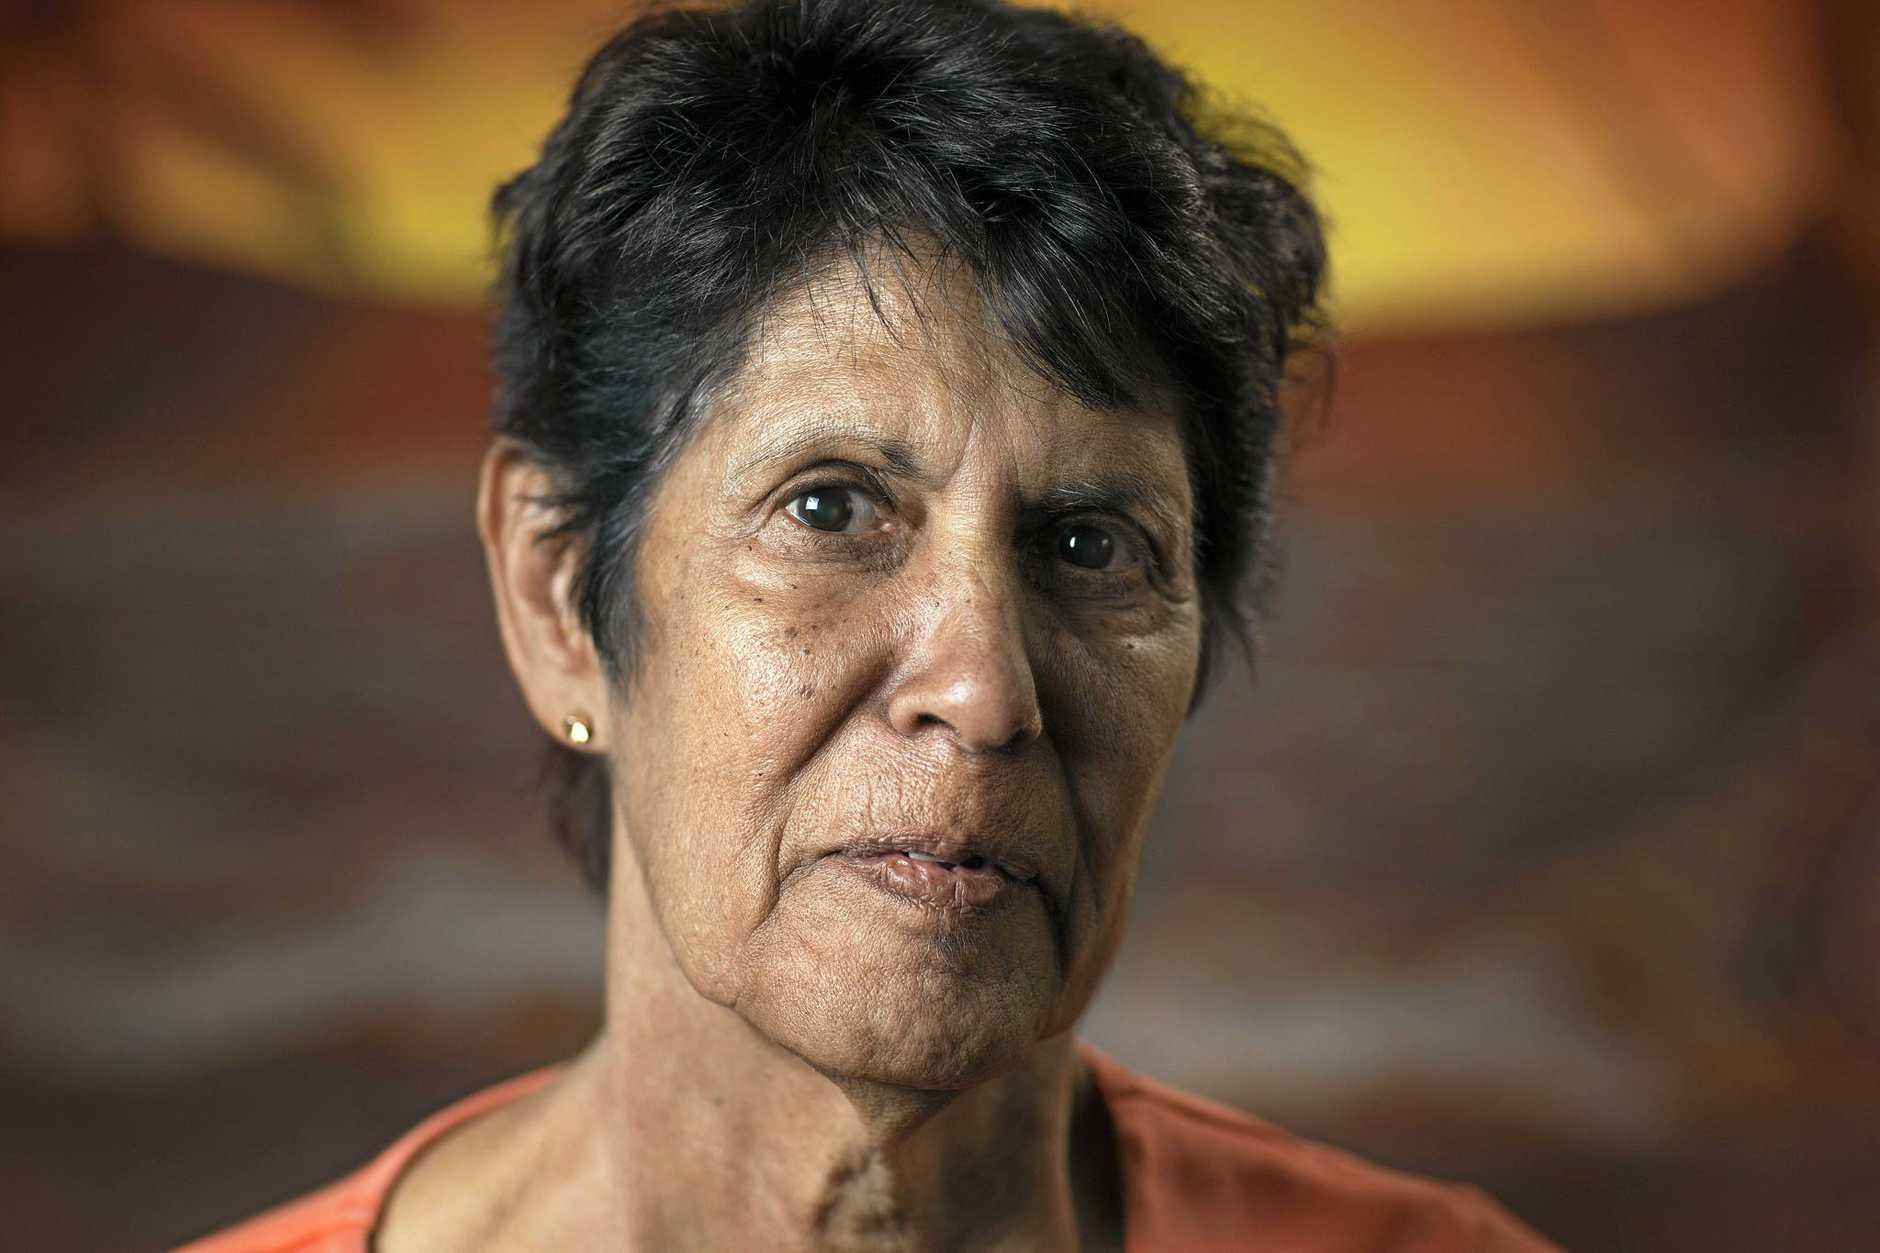 Senior Australian of the Year Award 2017 national finalist, Patricia Buckskin.